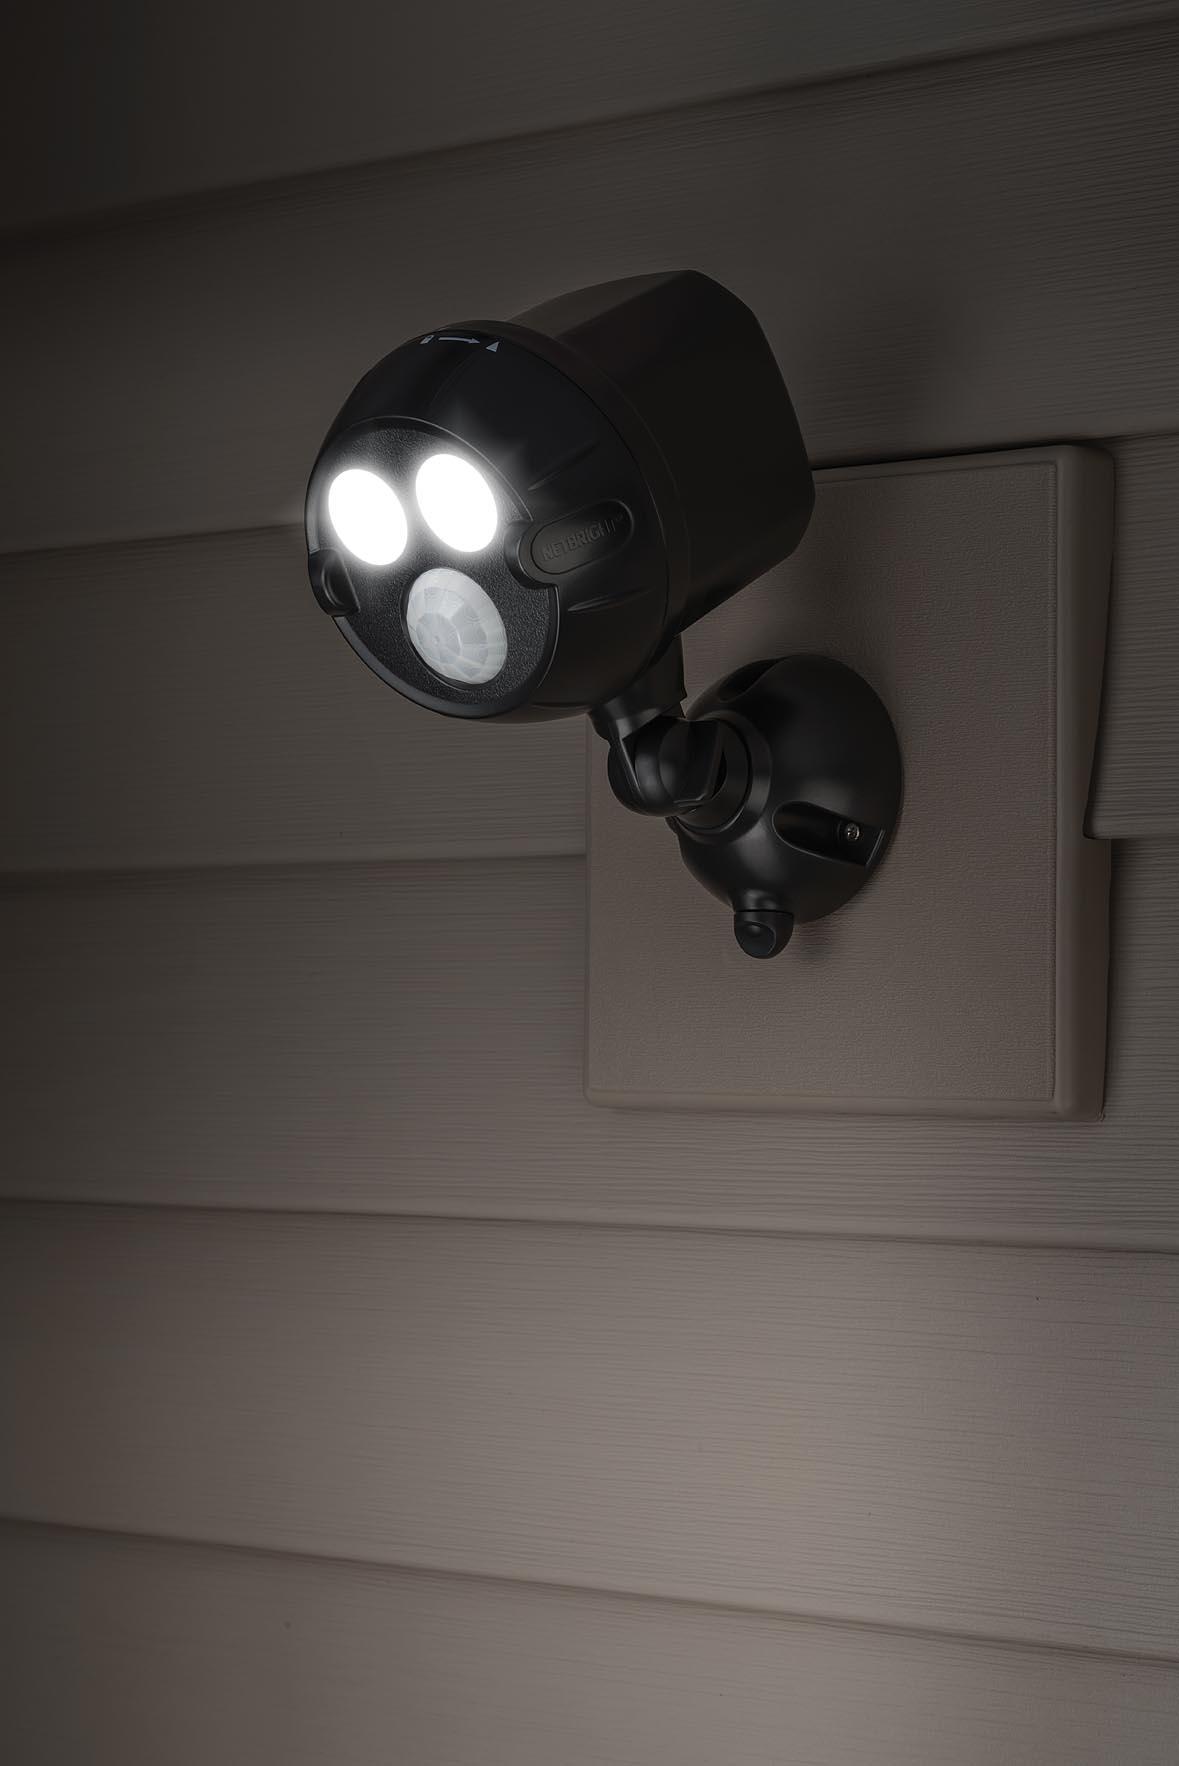 MR BEAMS NETBRIGHT MBN391 Sensorlampe - I Brug